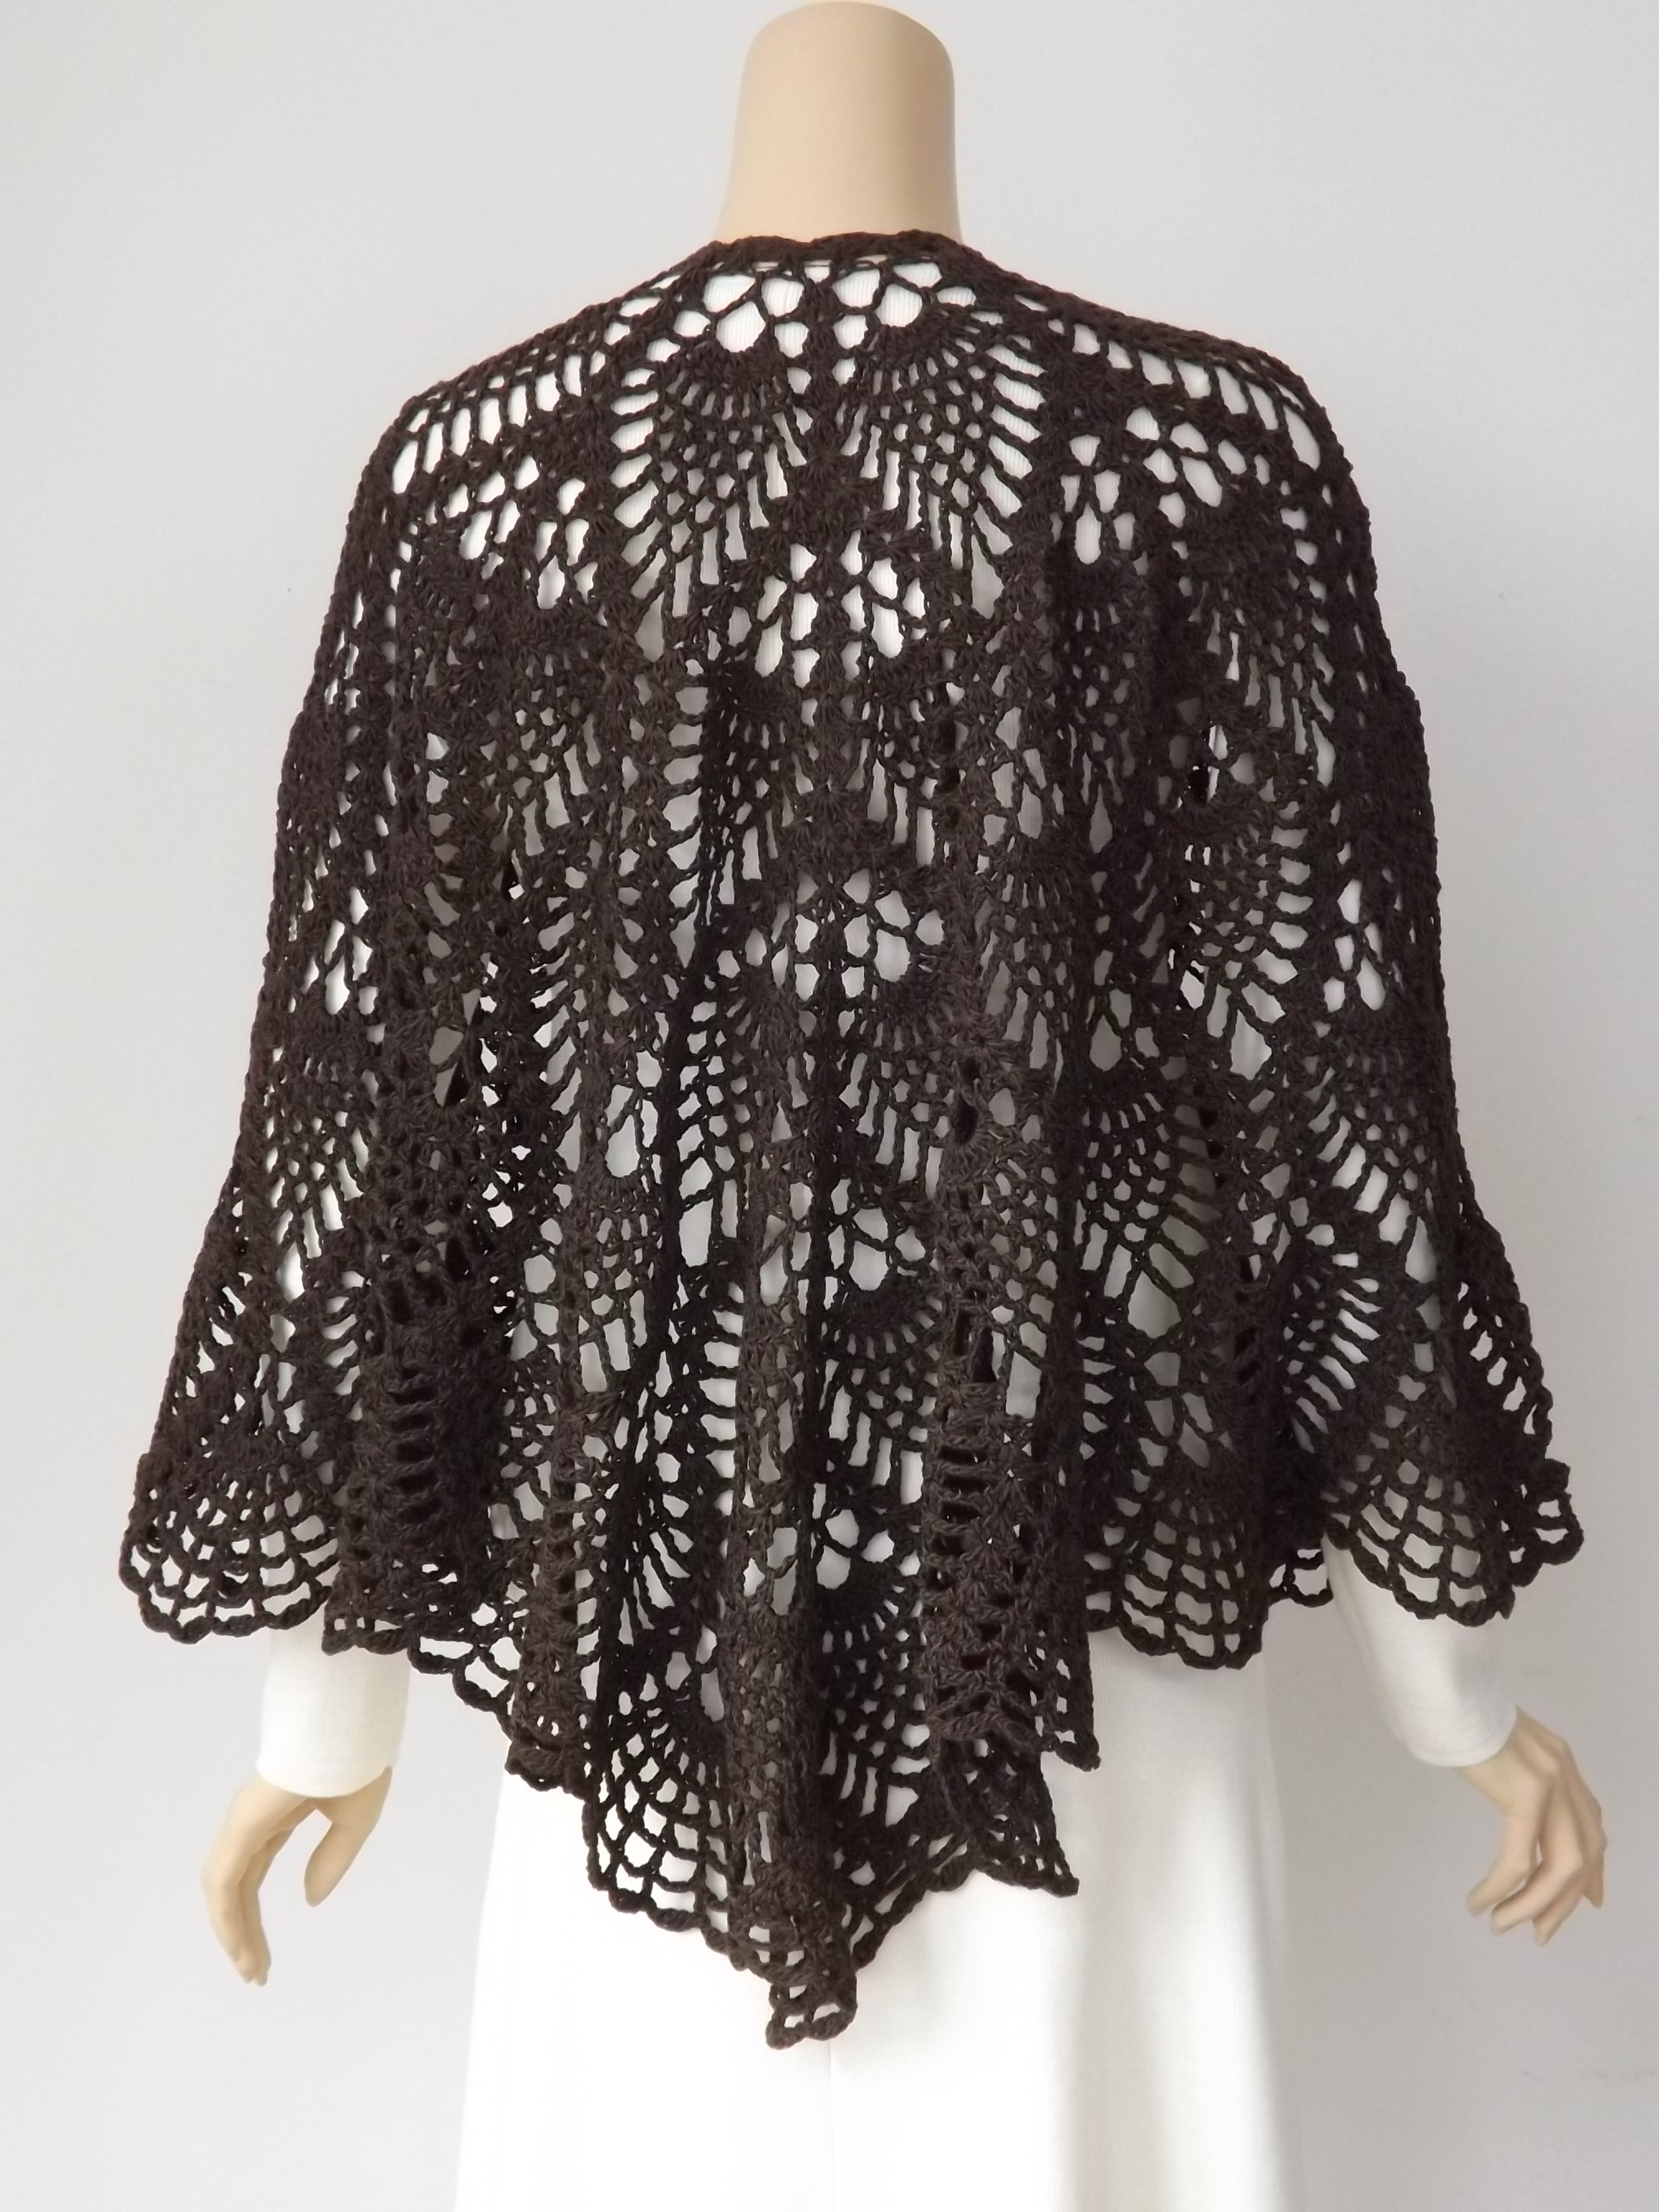 Doris Chan Crochet   Musings from Doris Chan, crochet designer ...